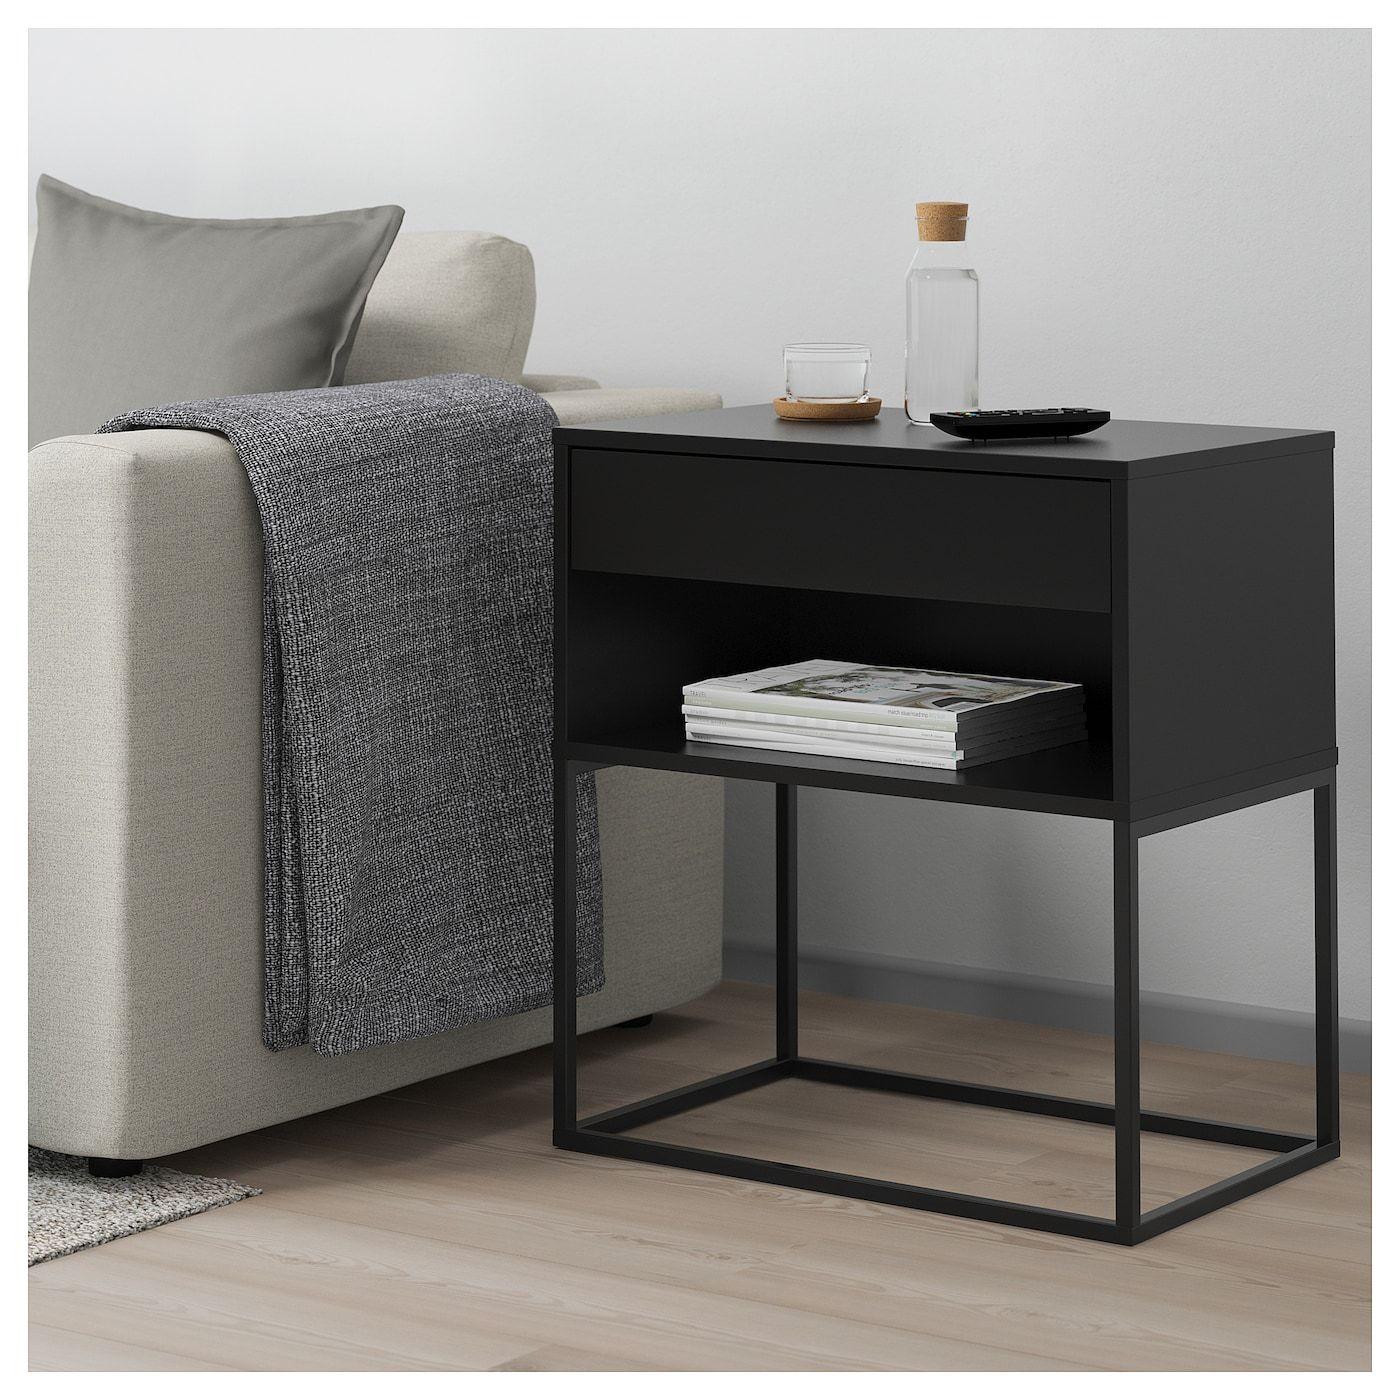 Ikea Us Furniture And Home Furnishings Ikea Coffee Table Coffee Table Ikea Side Table [ 2000 x 2000 Pixel ]